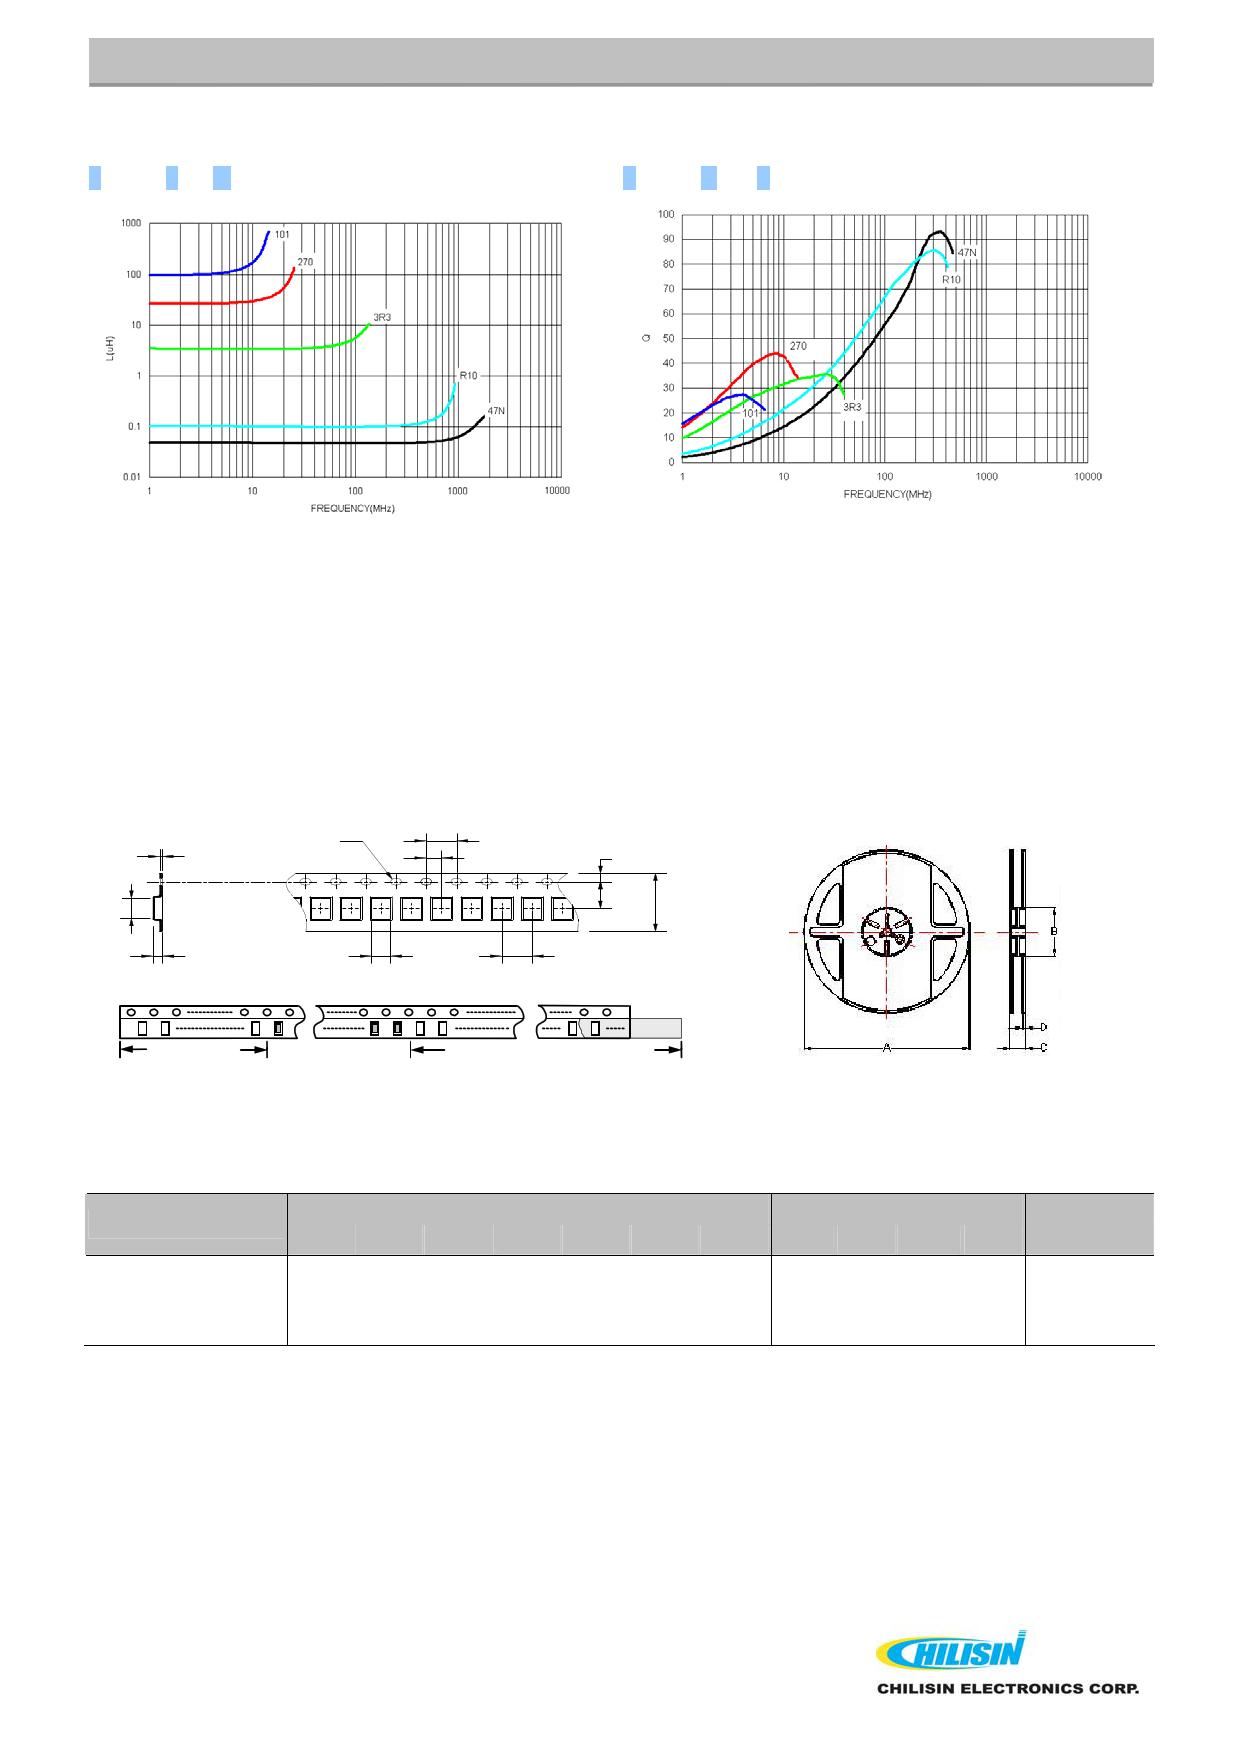 NL252018T pdf, 반도체, 판매, 대치품